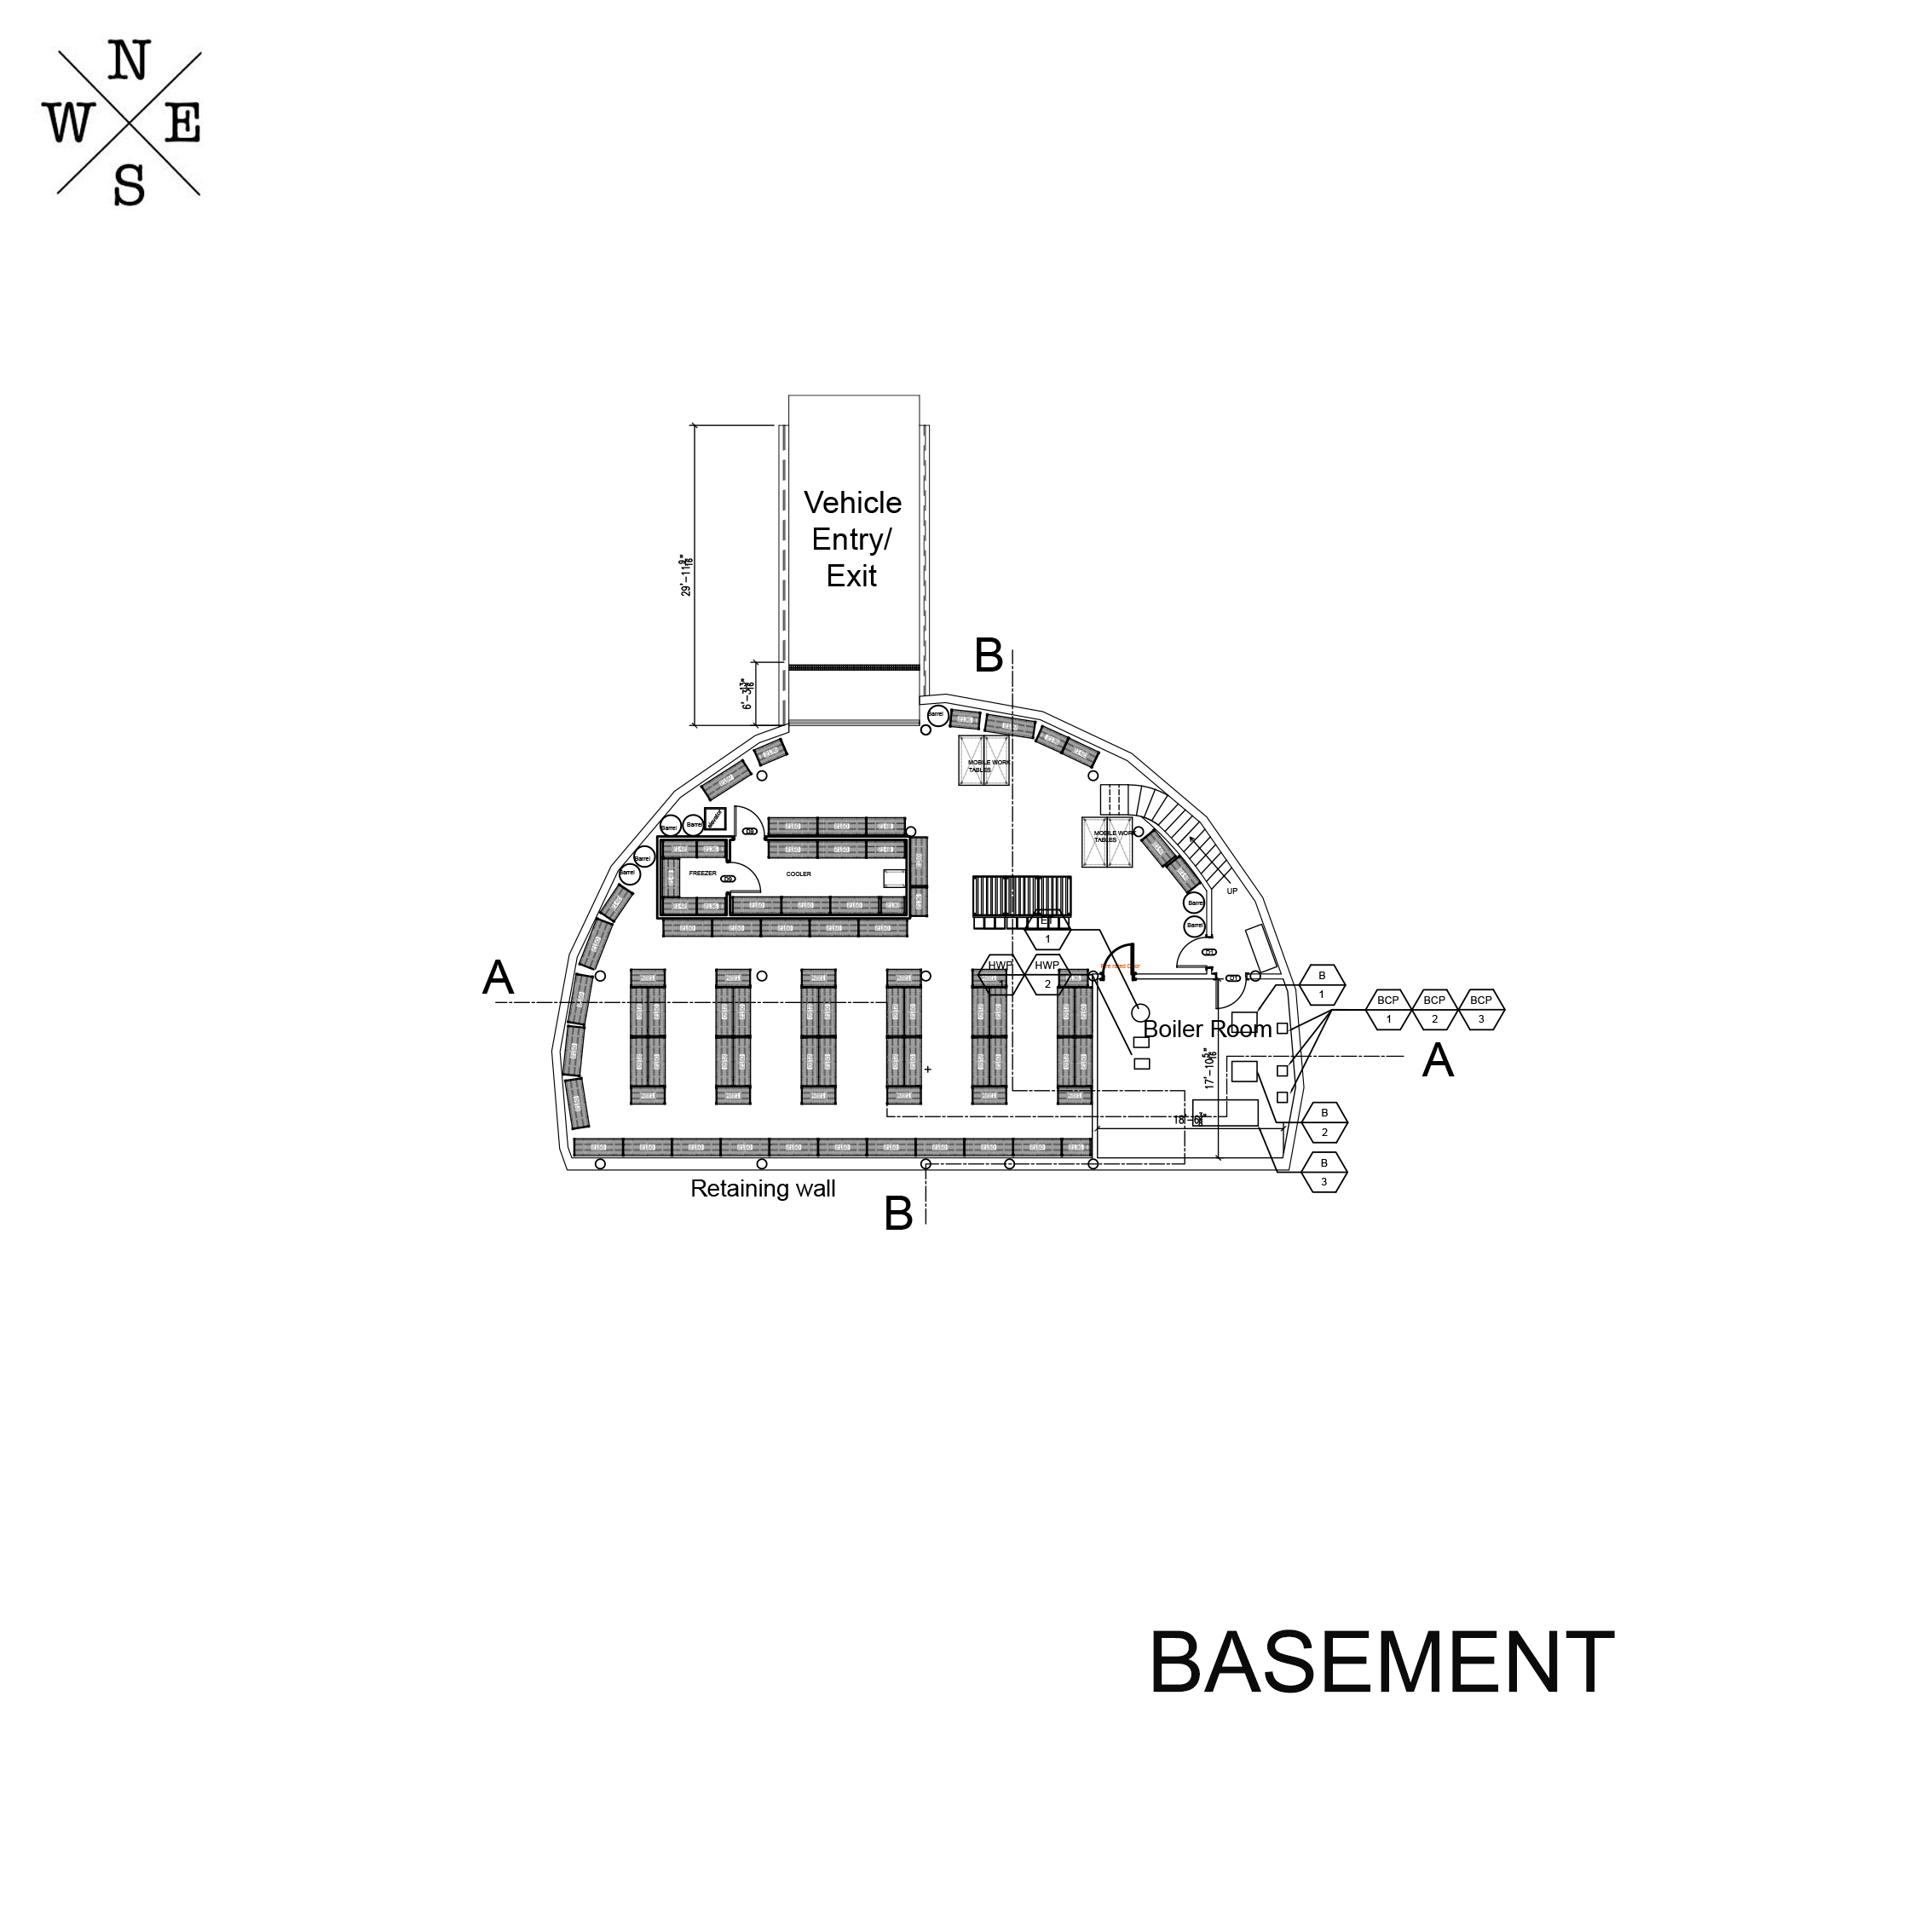 Room Basement Near Mavis And Derry